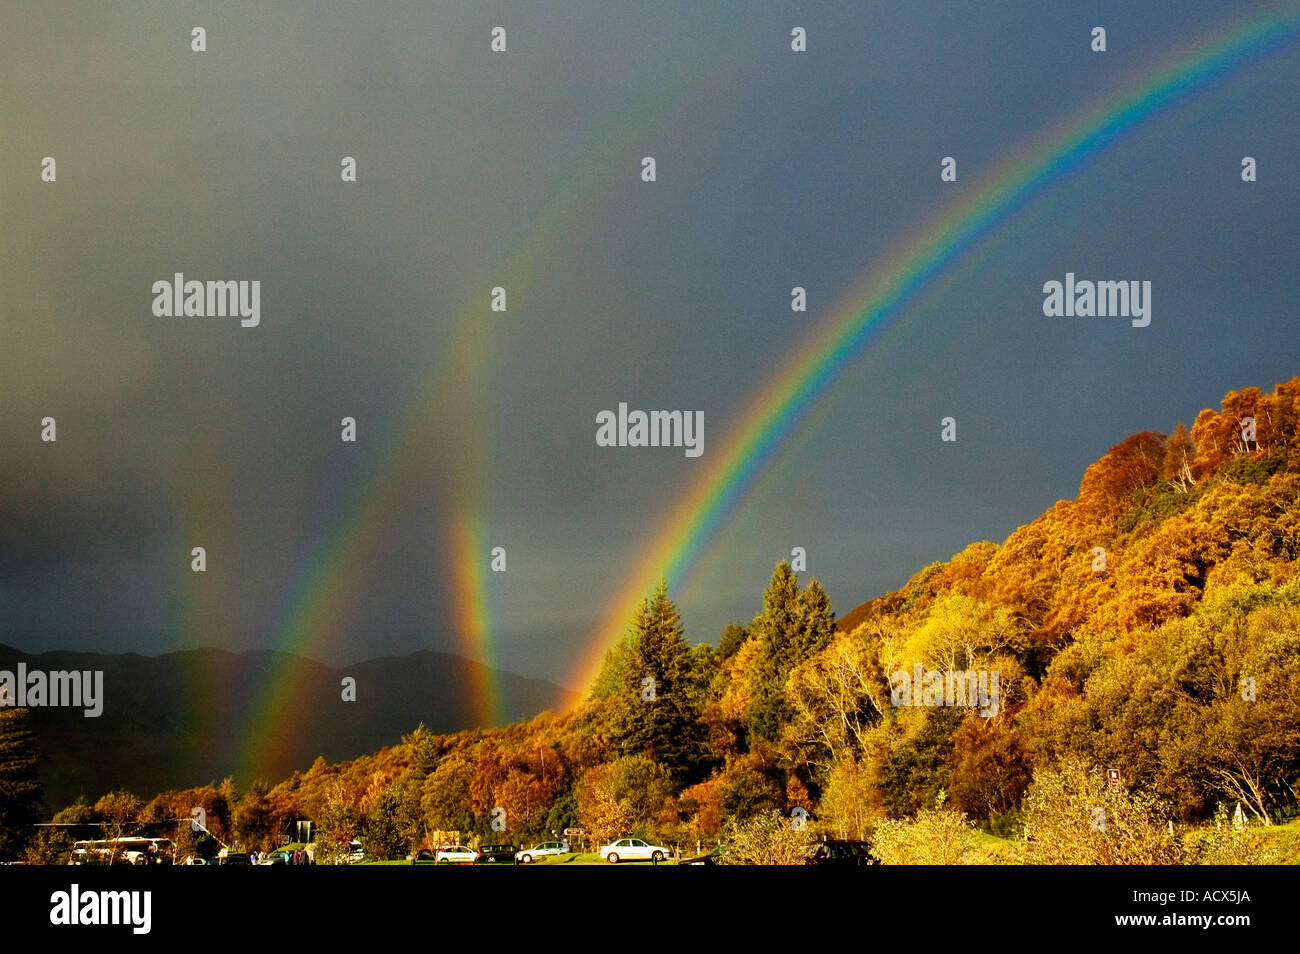 double-reflection-rainbow-loch-duich-near-dornie-invernessshire-scotland-ACX5JA.jpg